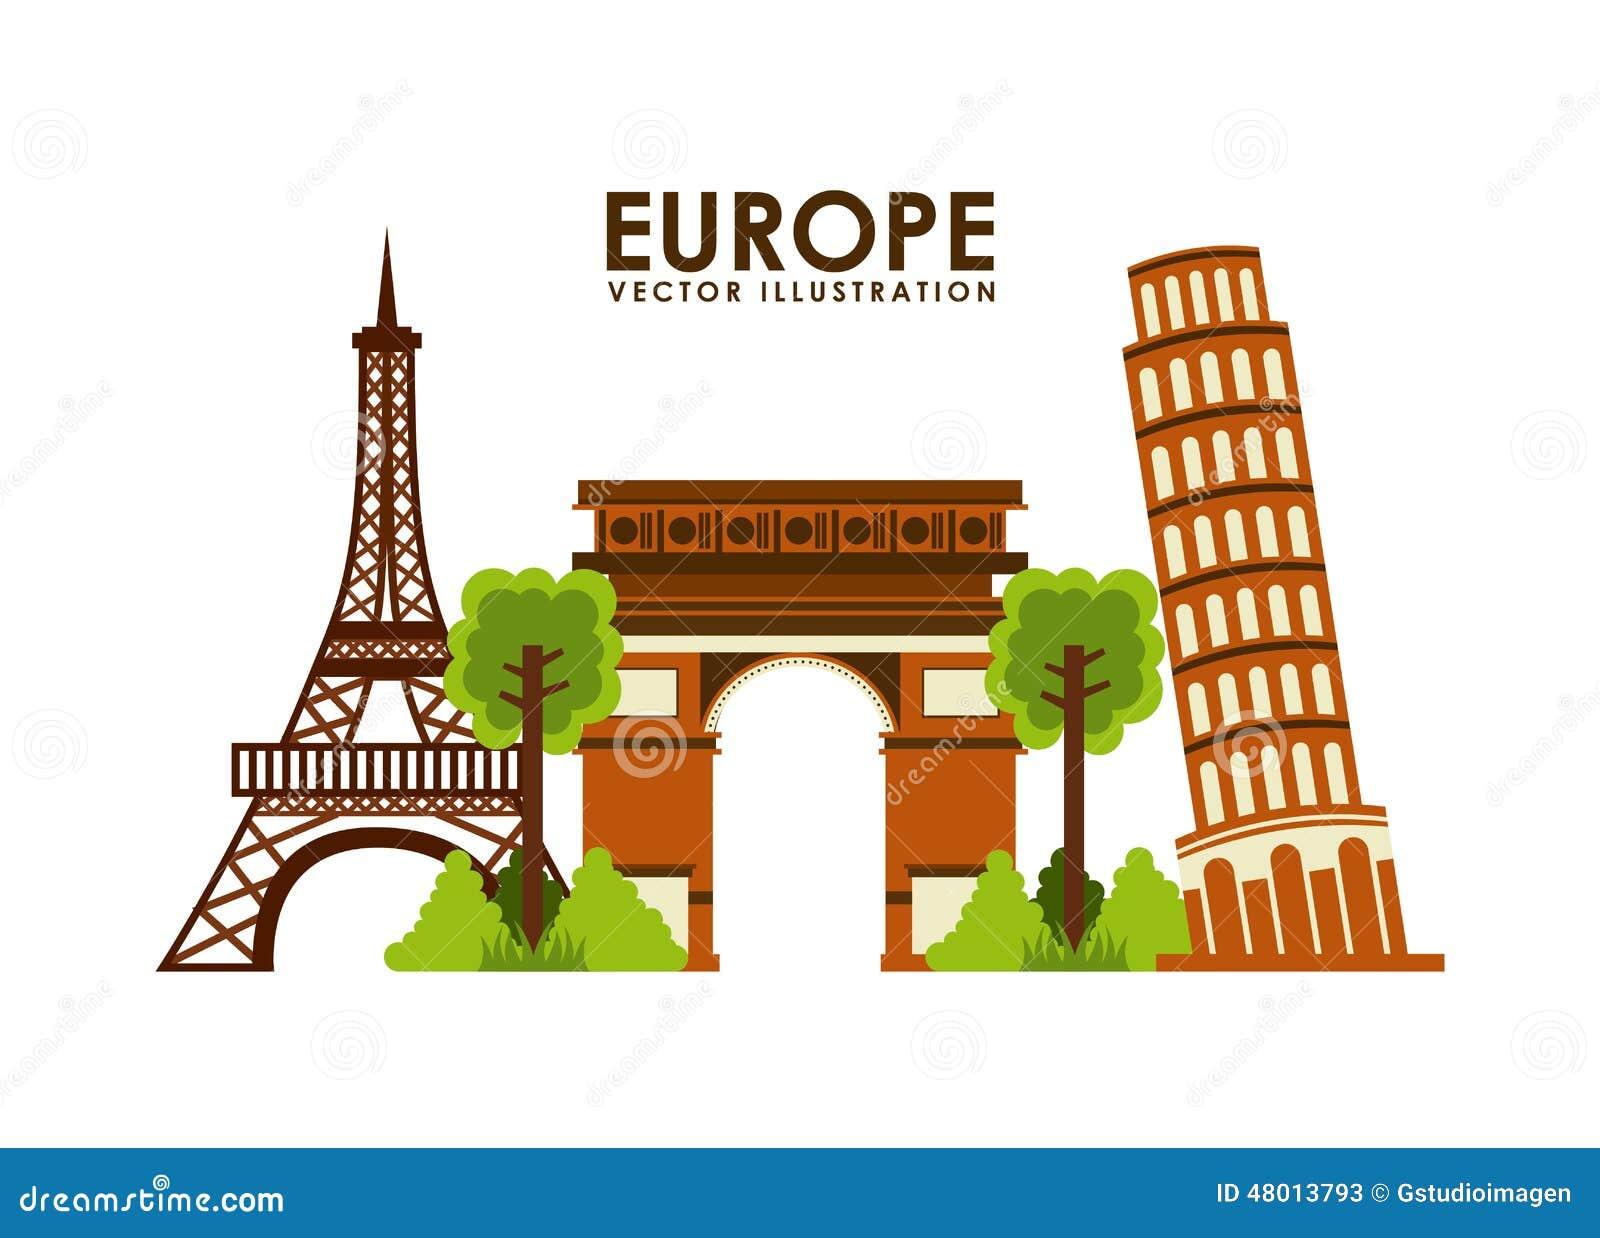 Europe design stock illustration image 48013793 for European design